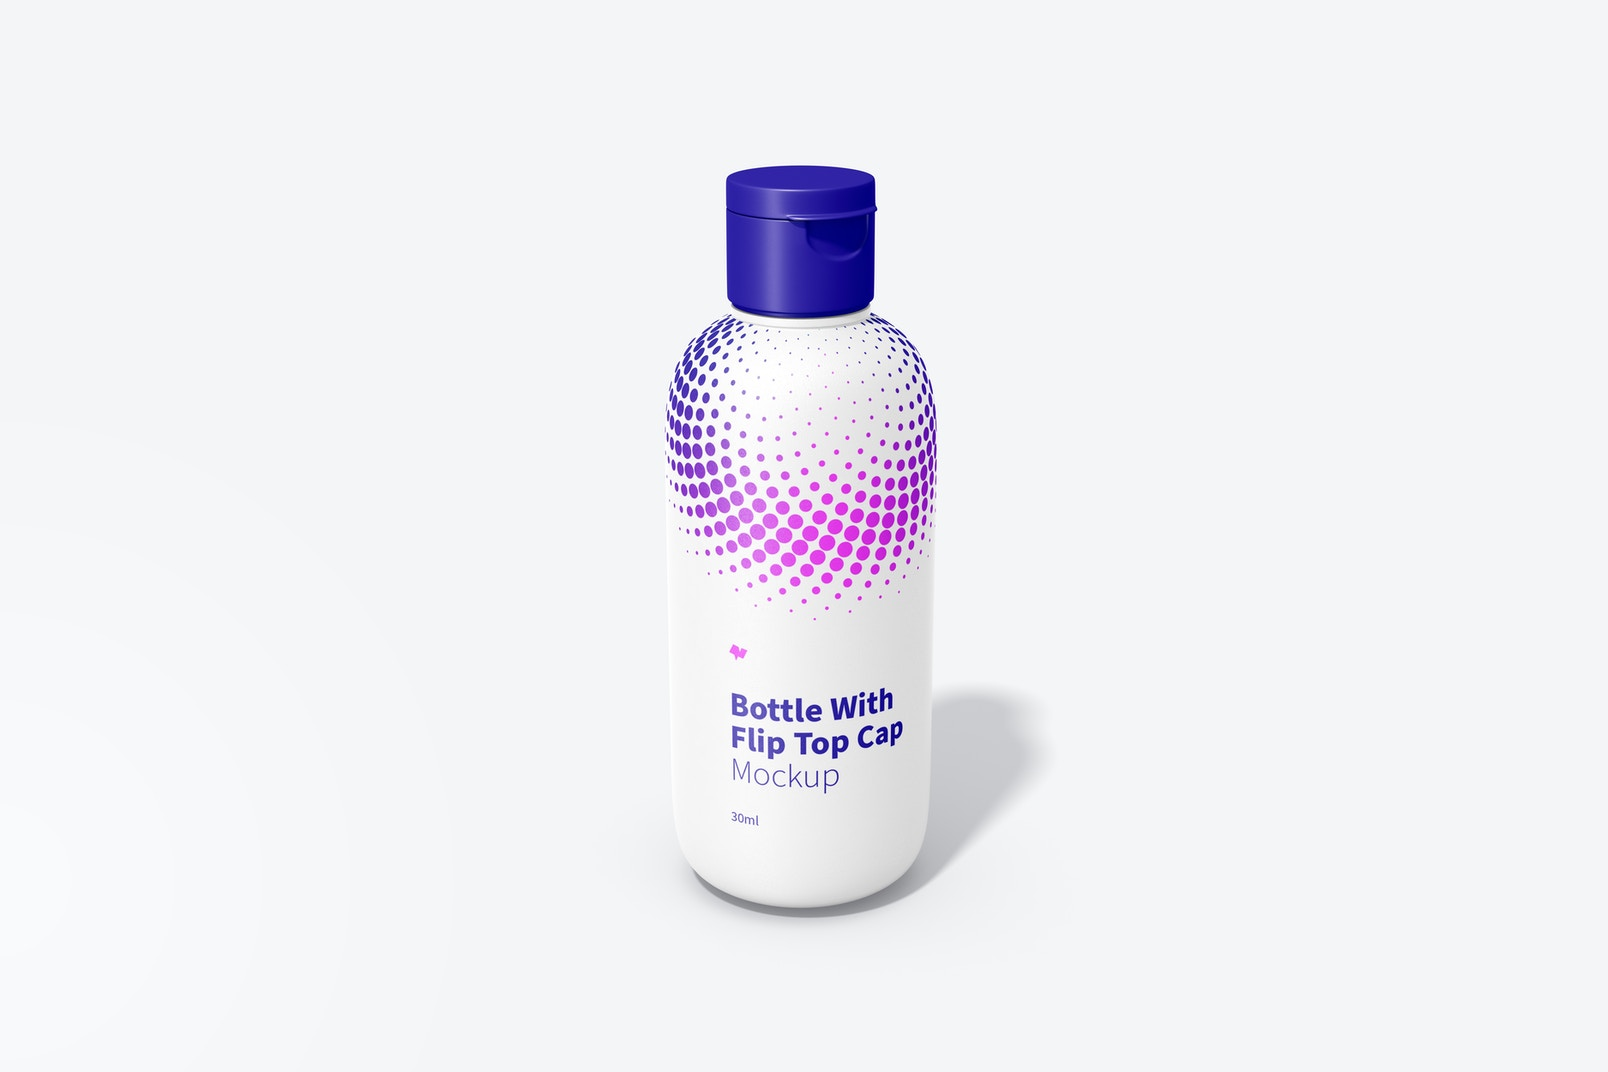 30ml Bottle With Flip Top Cap Mockup, Front View